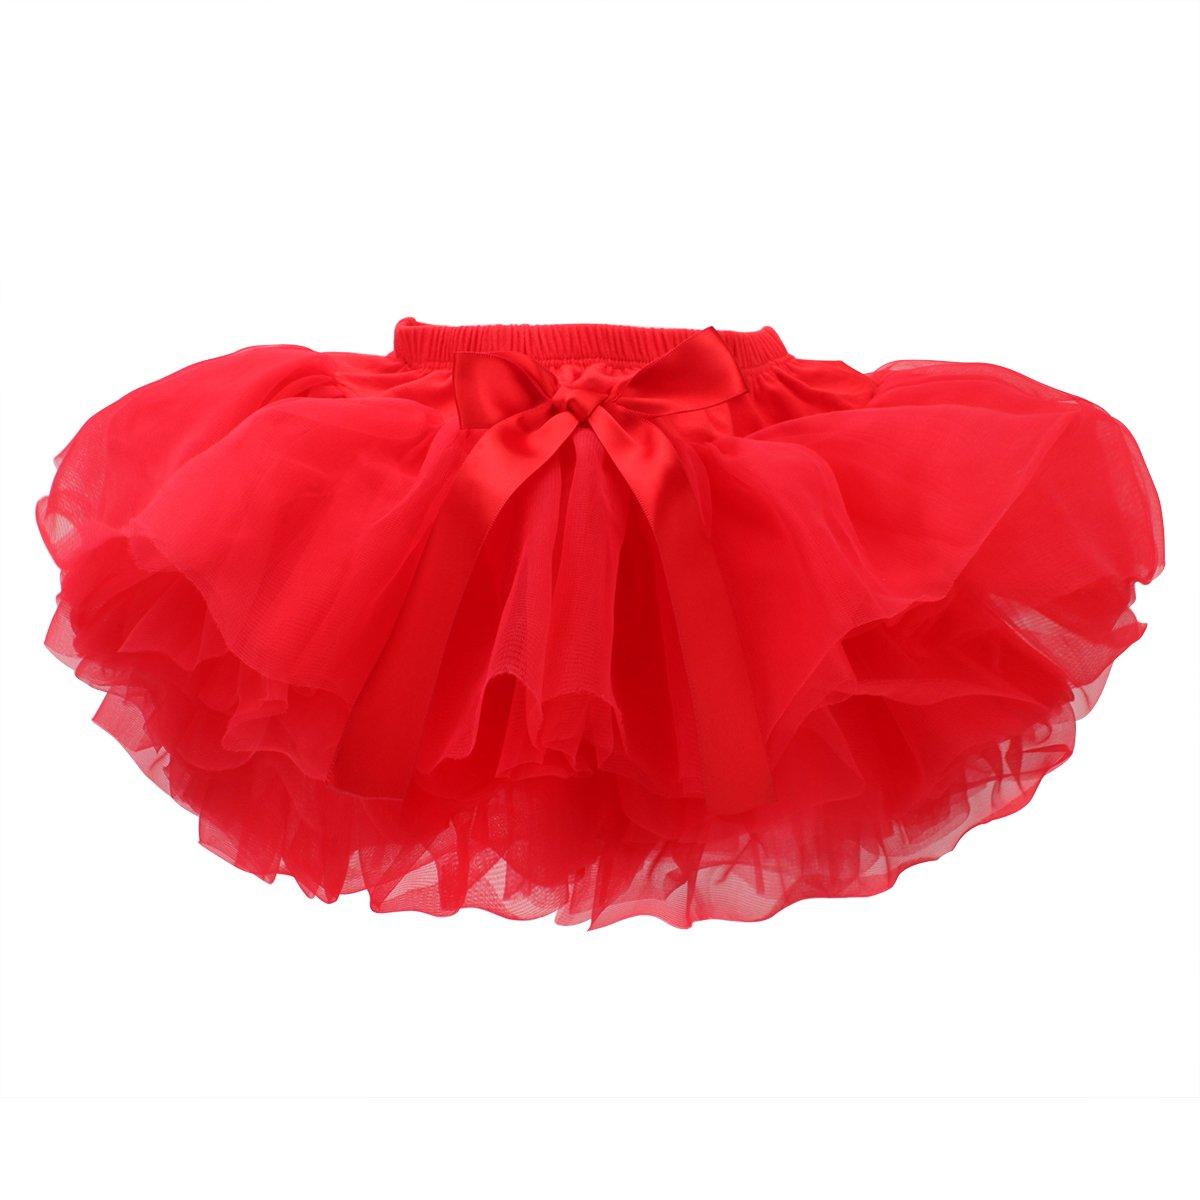 COTTON FAIRY Baby Girls Tutu Skirt Infant Tutus 5 Layers Tulle Dress White